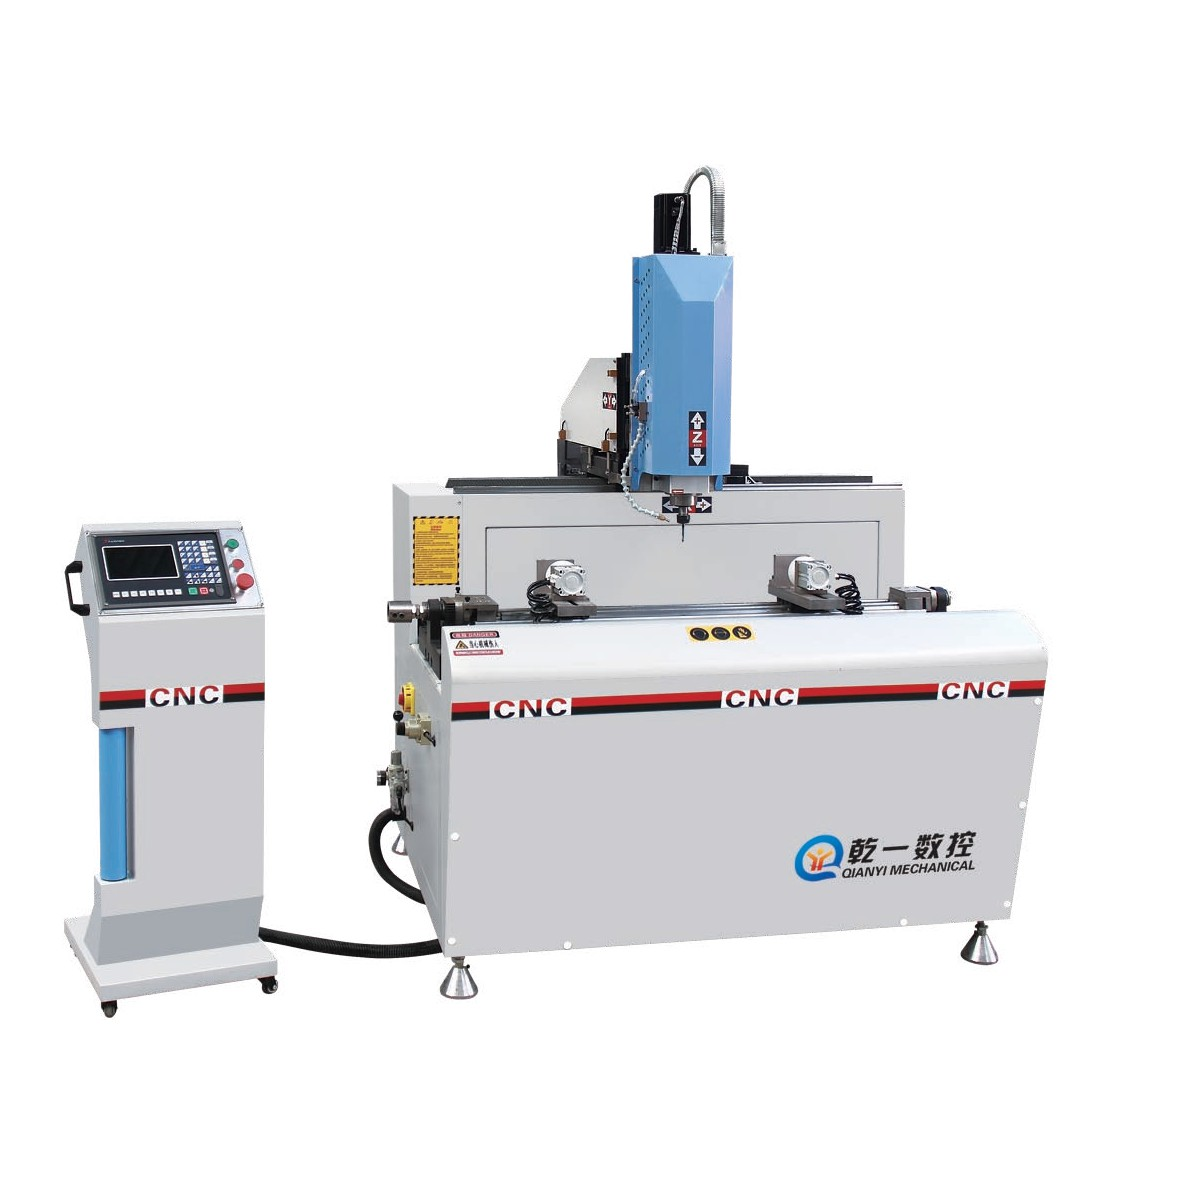 SKX3+1-CNC-800 铝型材3+1轴数控钻铣床(伺服步进可定制)